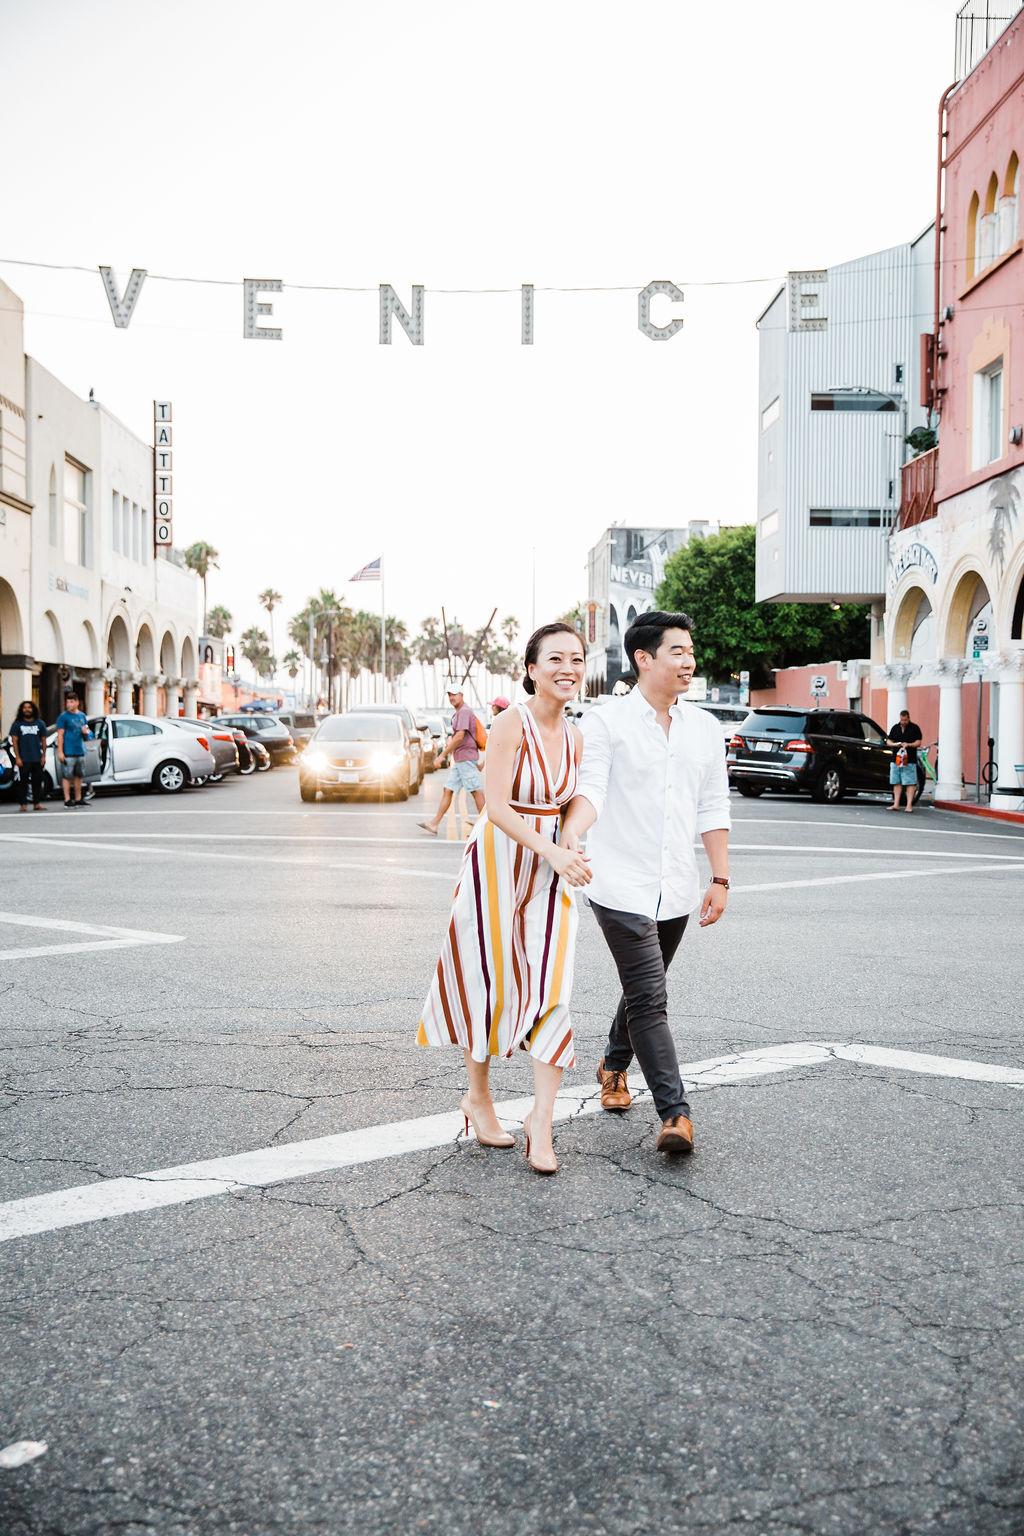 Venice Beach Engagement Photography 1 Los Angeles Orange County Wedding Photographer Joy Theory Co